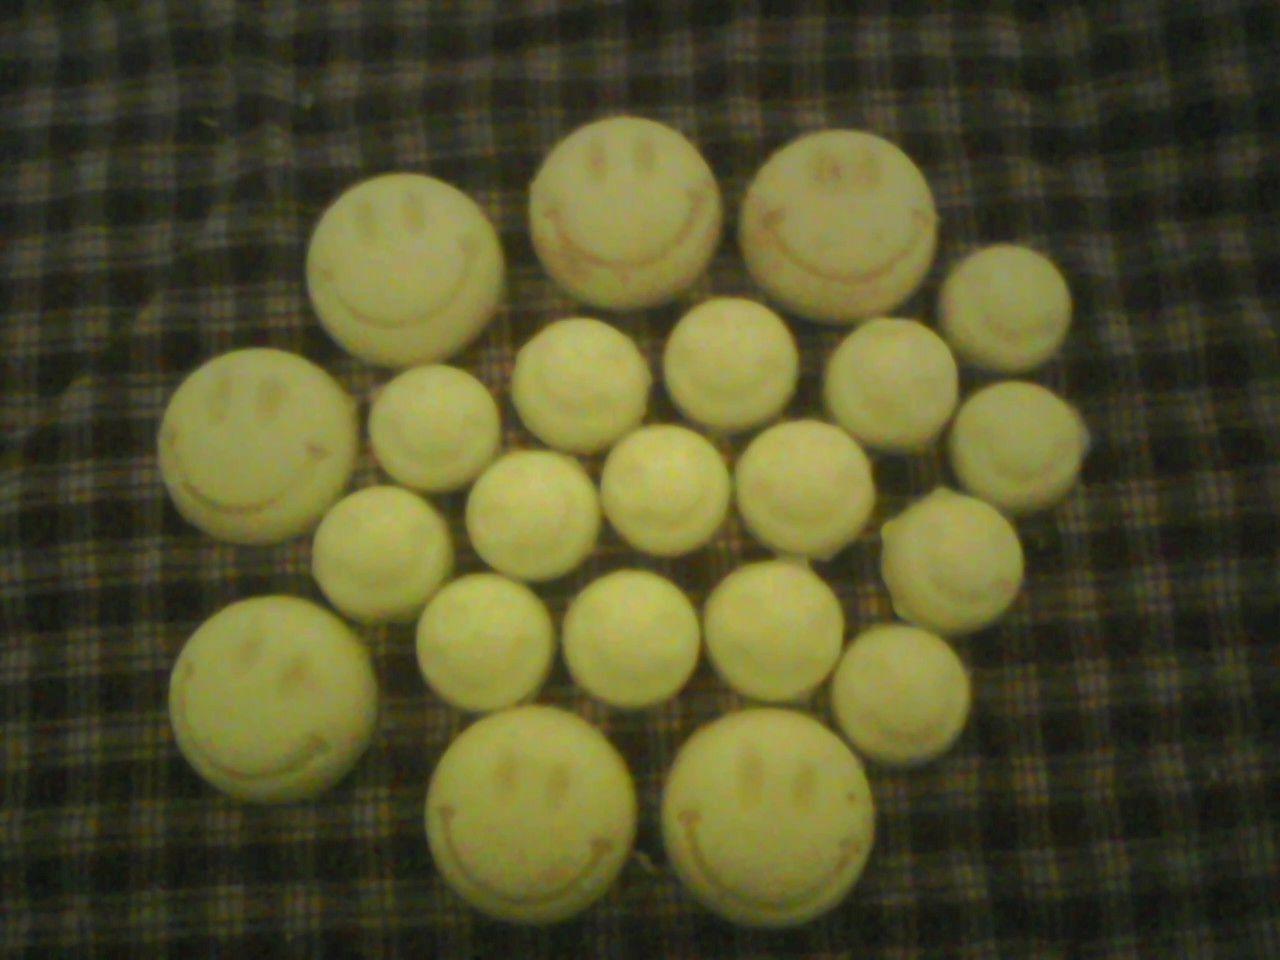 22 WAX SMILEY FACE TART/MELTS 8OZ. CUSTOM SCENT, DETAILED FA